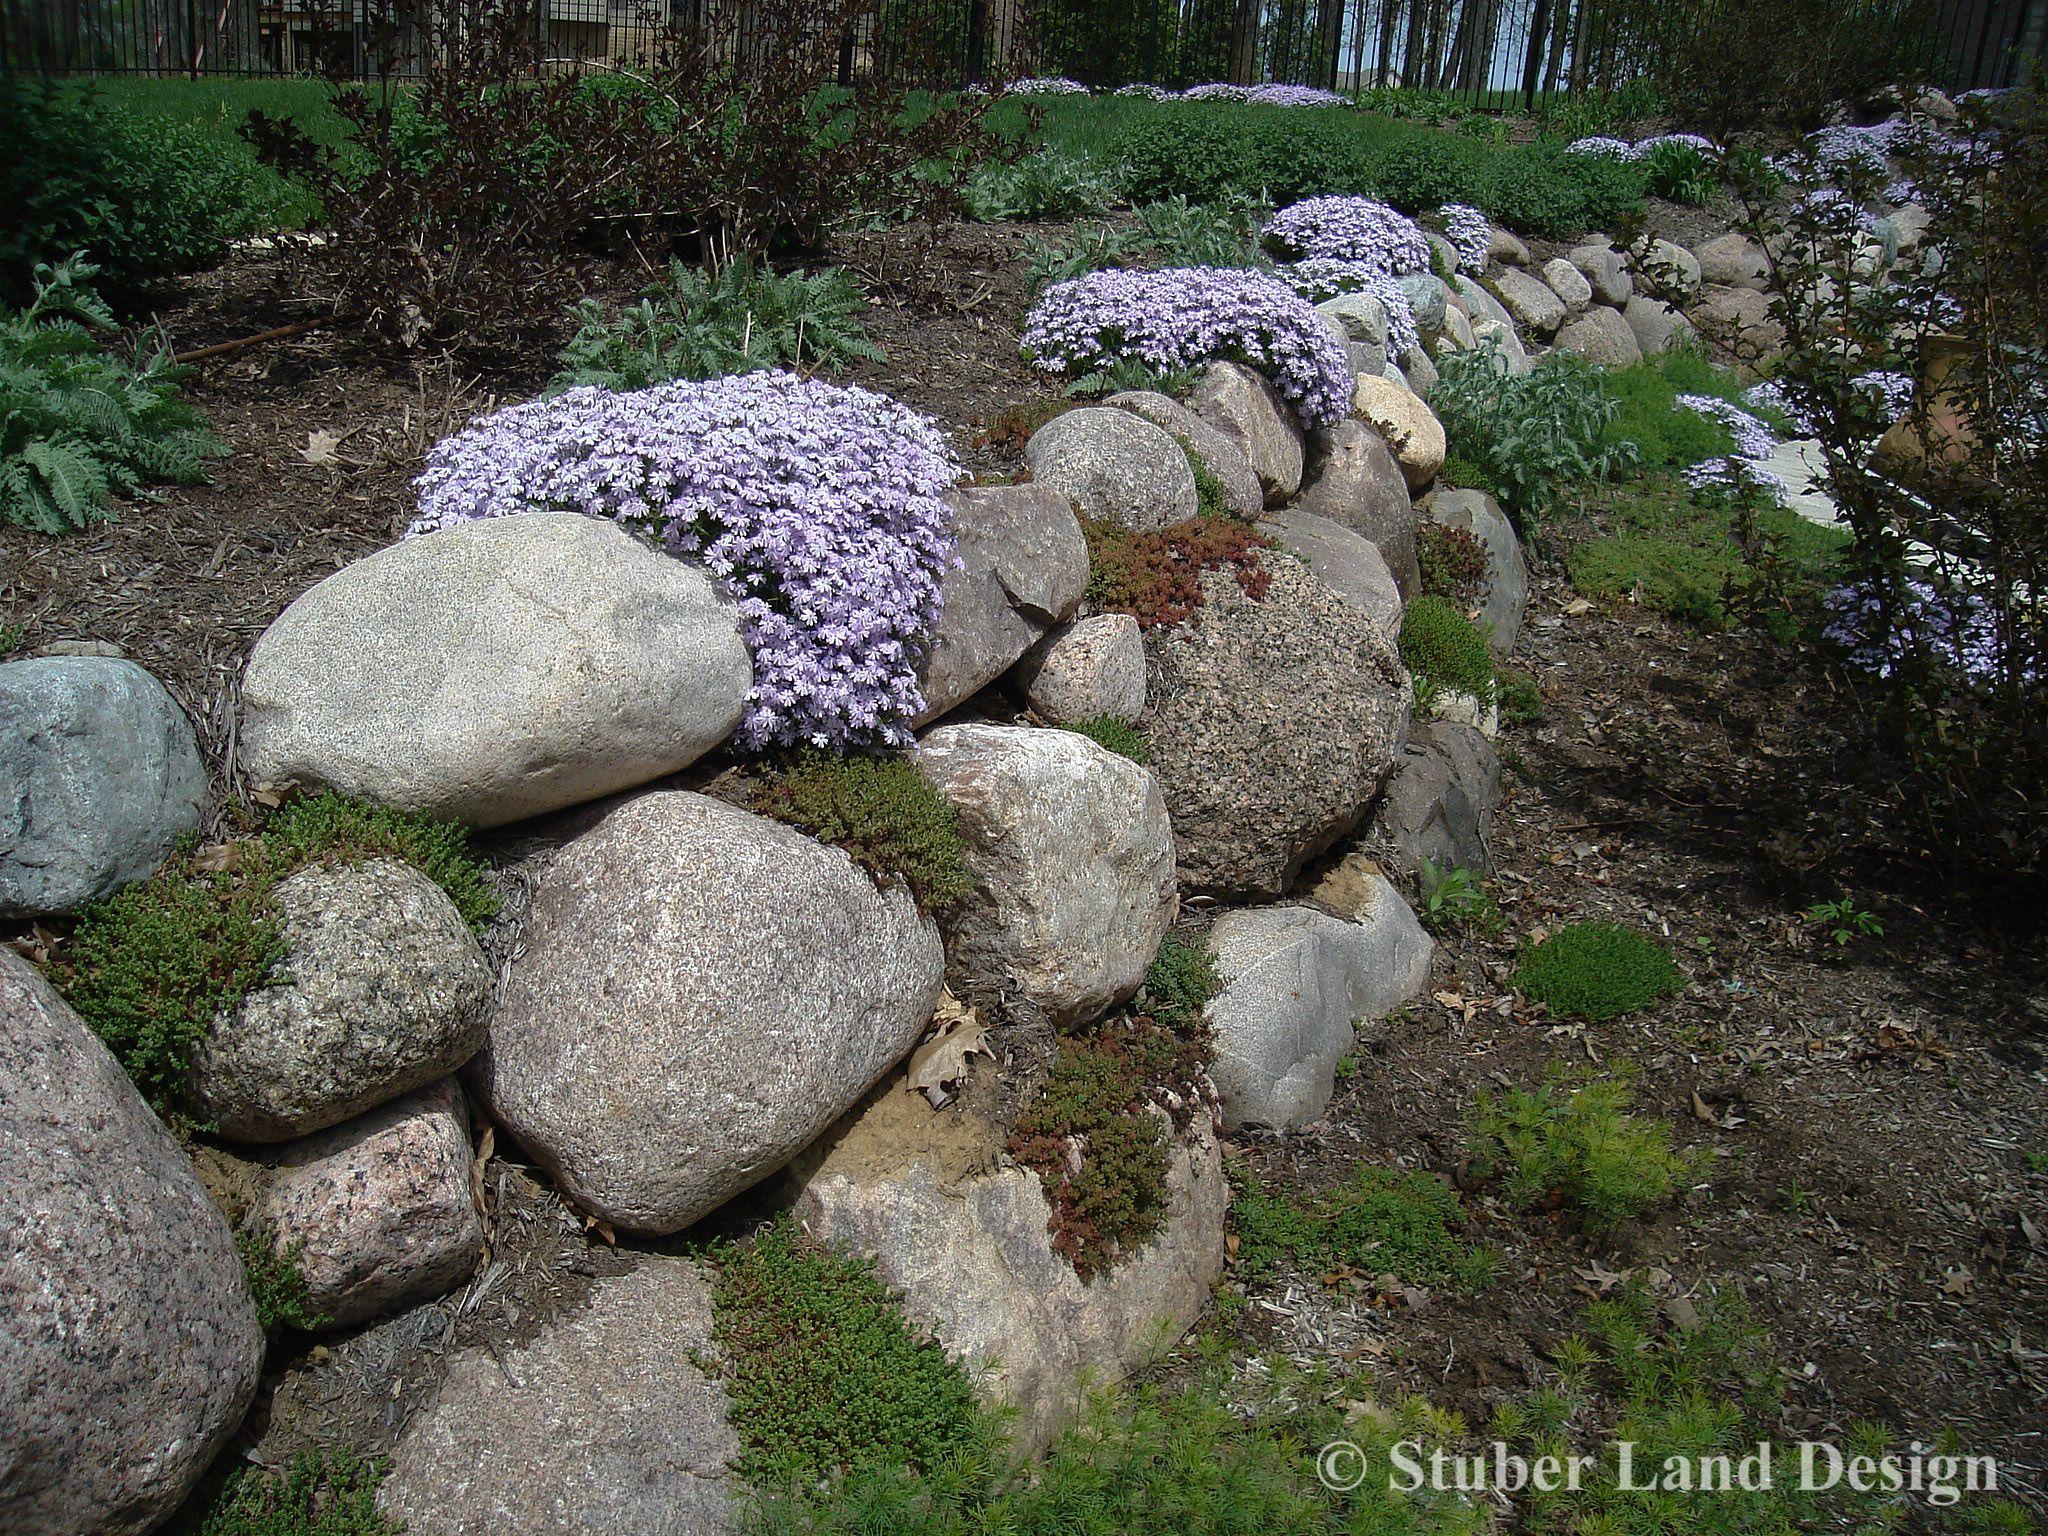 granite boulder retaining wall with sedum plantings nestled in the